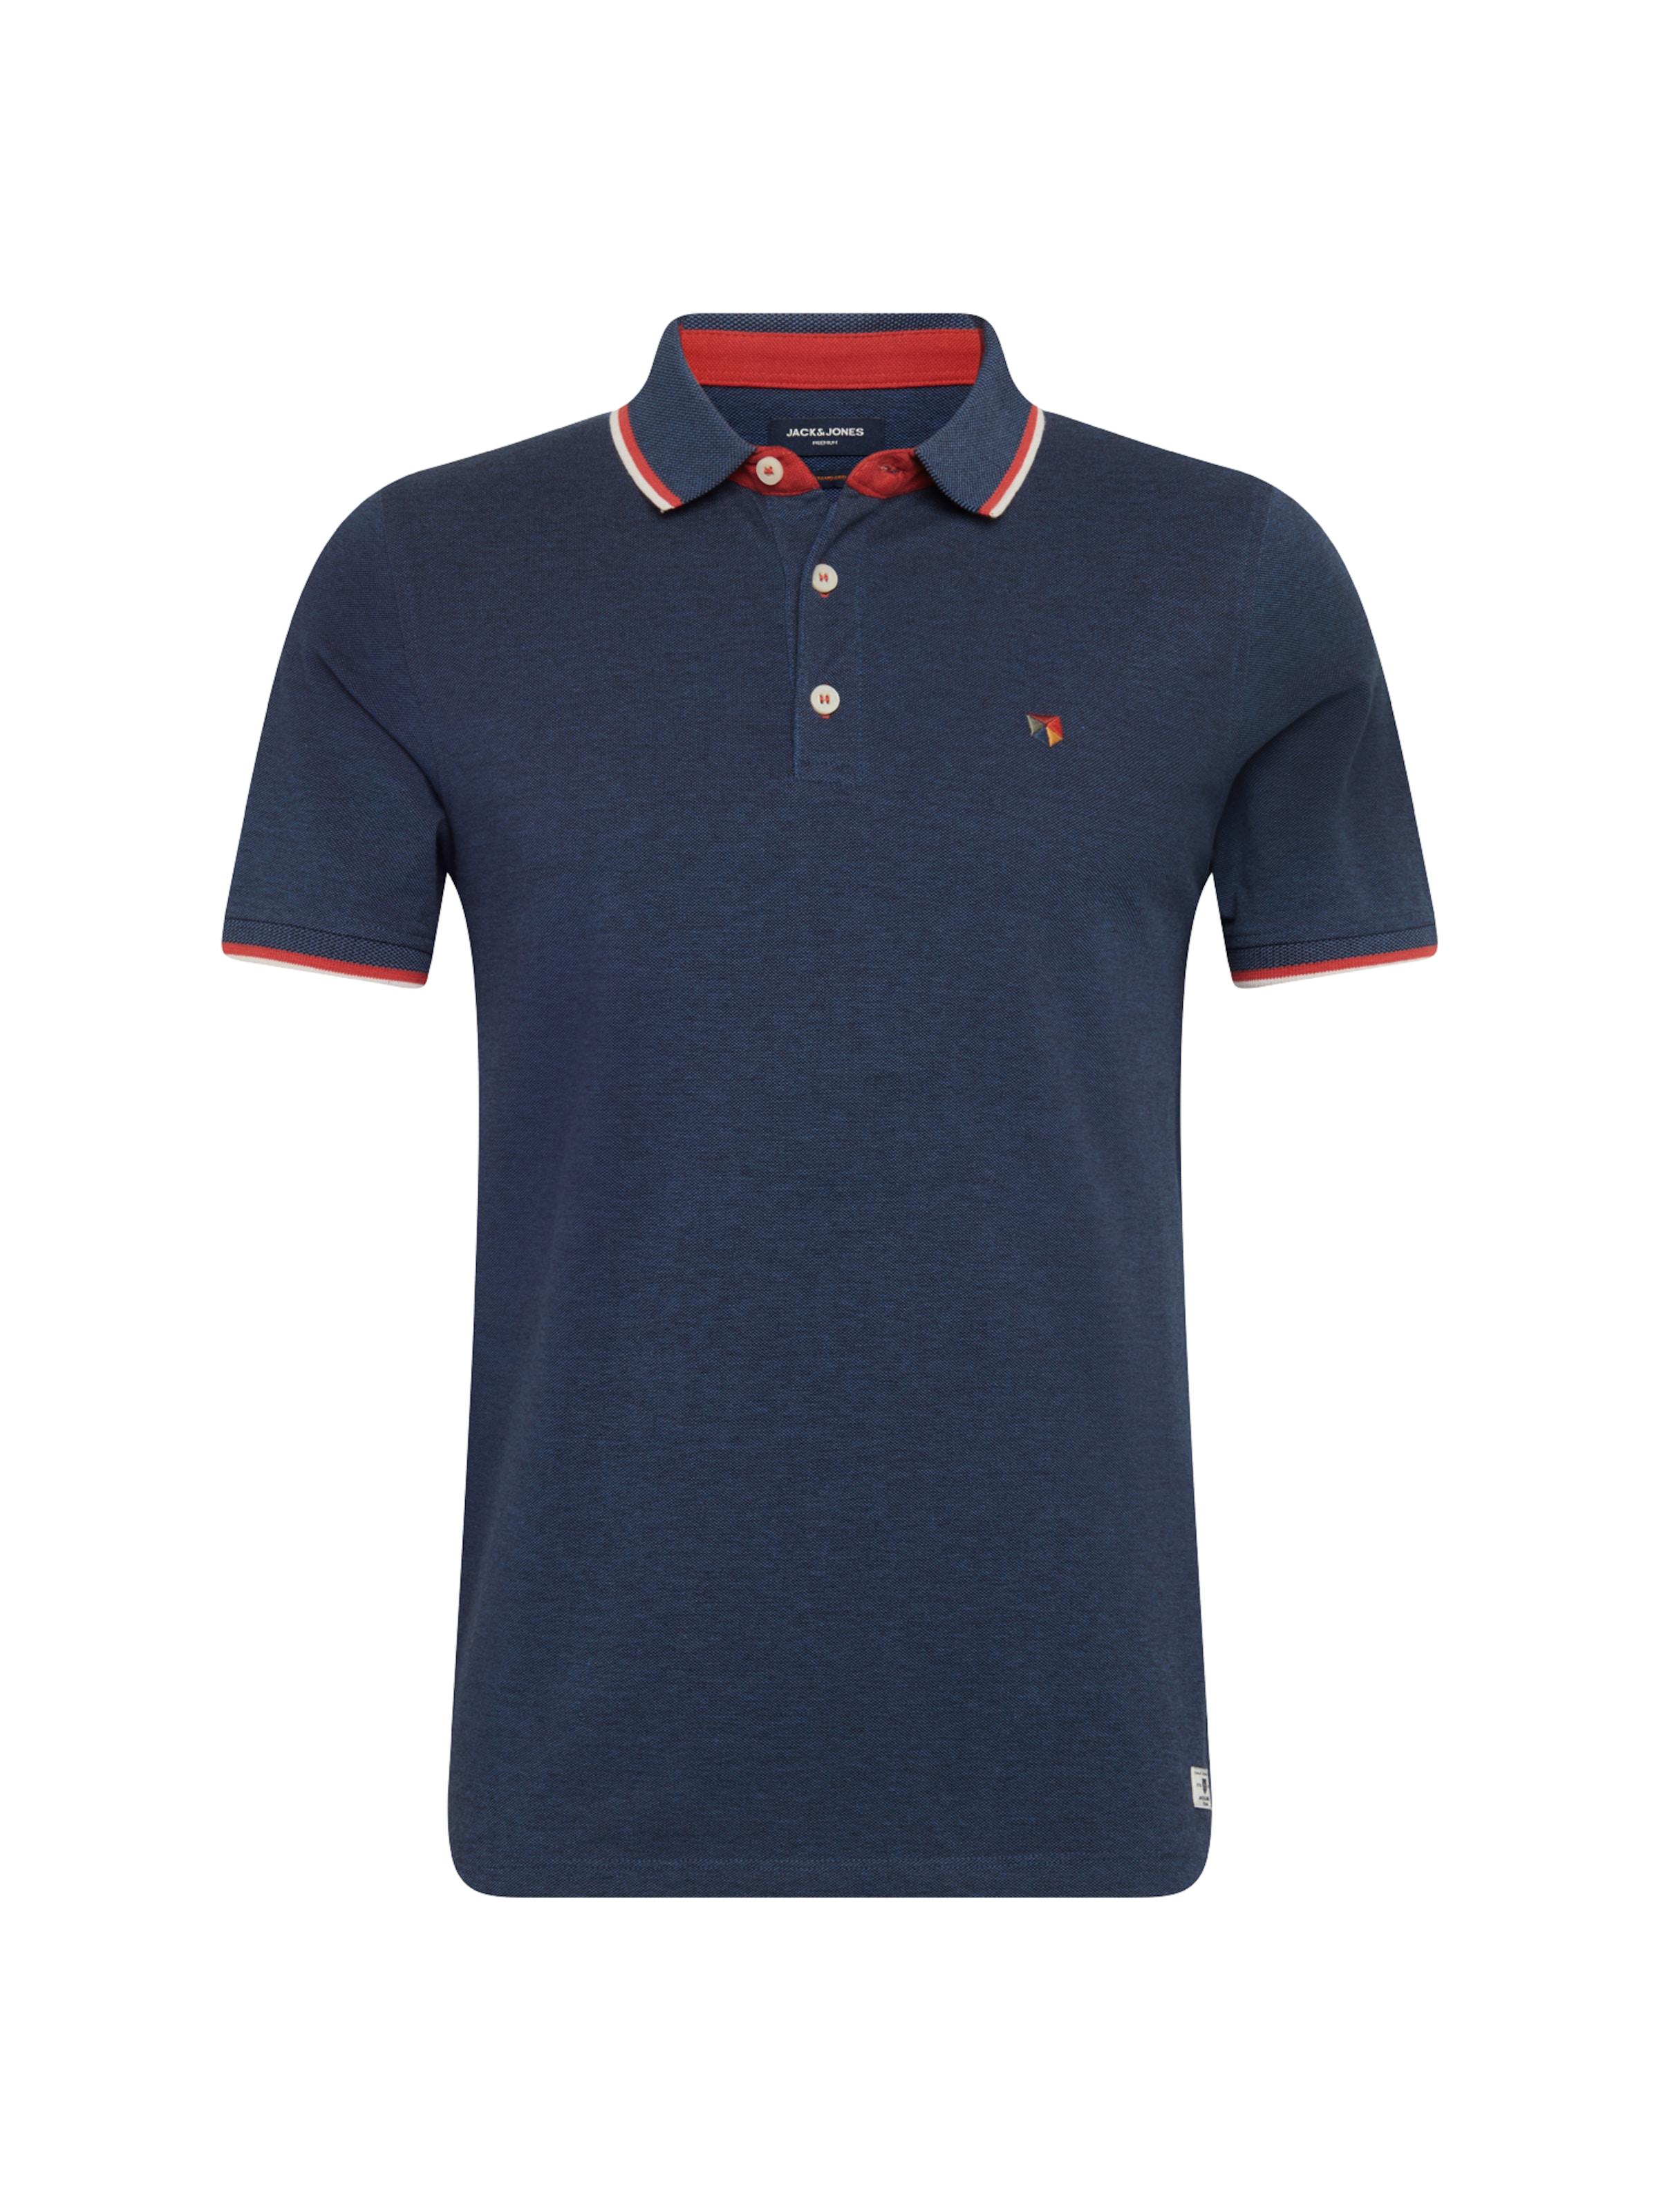 T shirt Jackamp; Bleu Jones MarineRouge Blanc En b7IYf6gvy